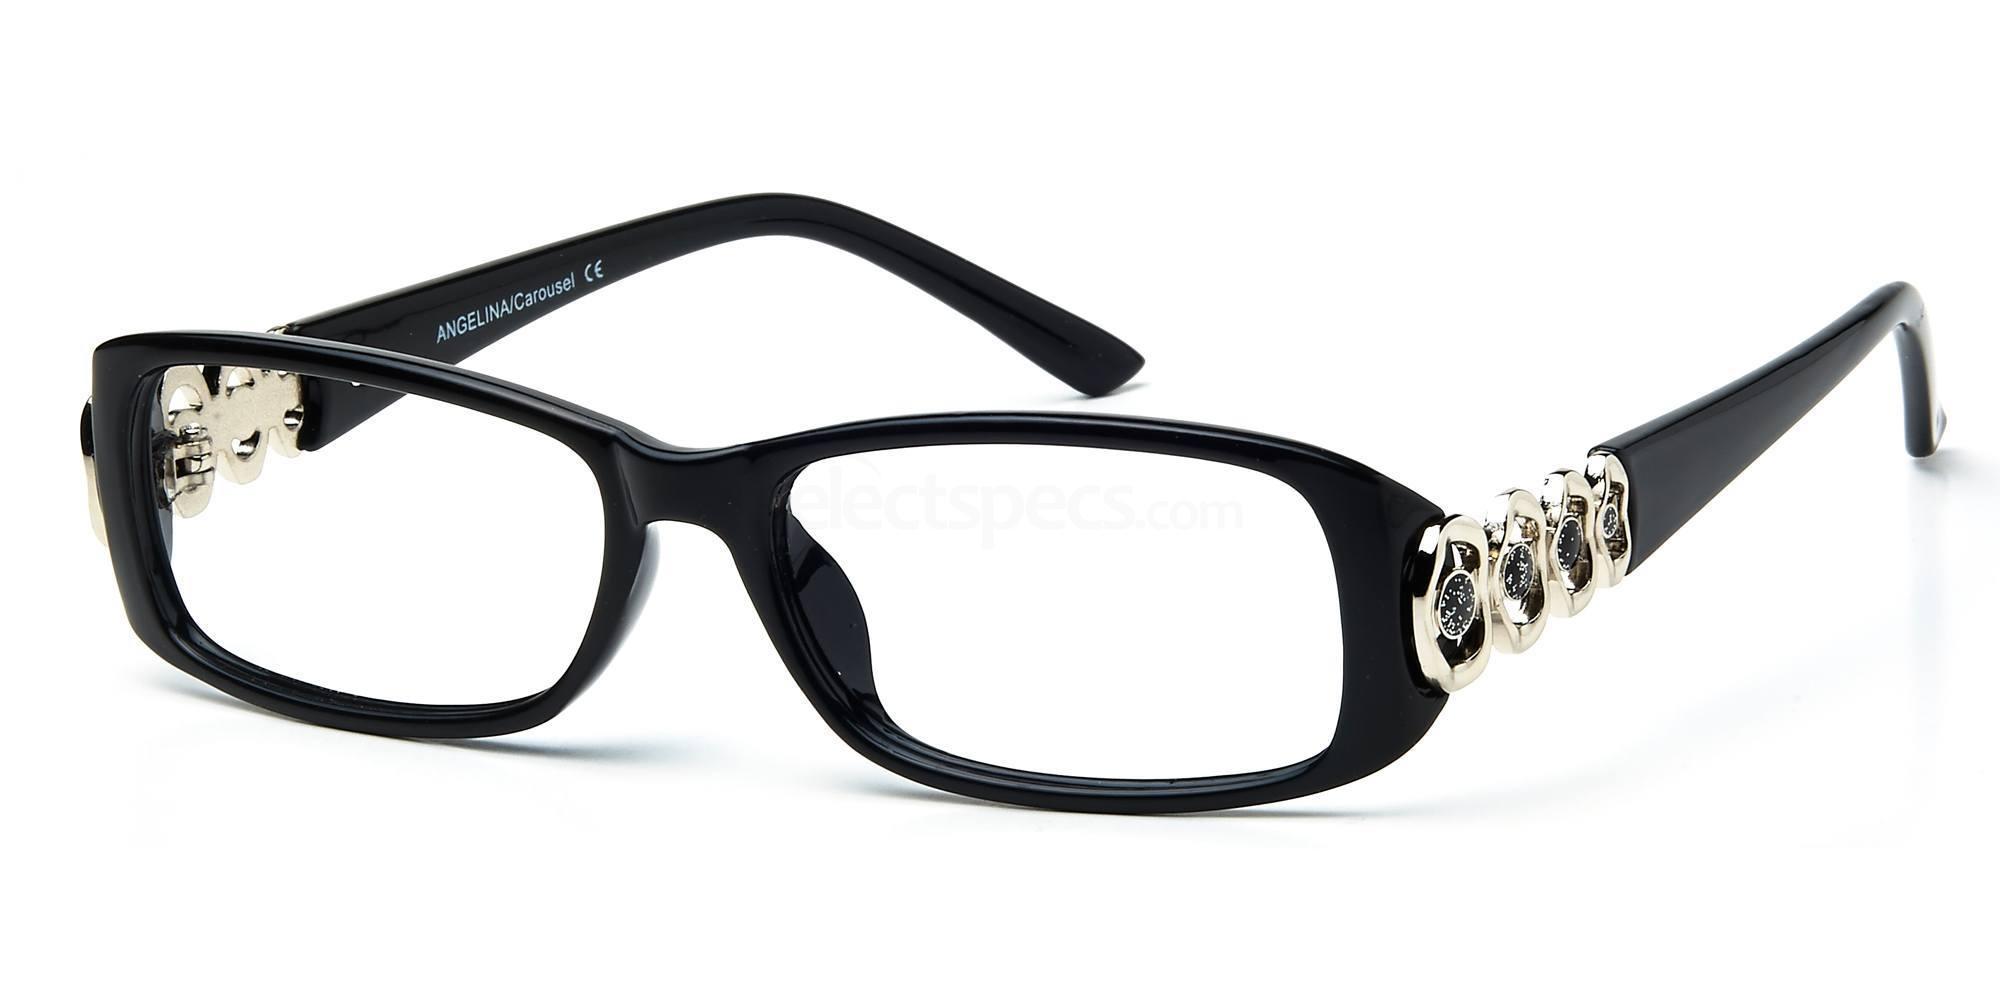 C1 ANGELINA Glasses, Carousel